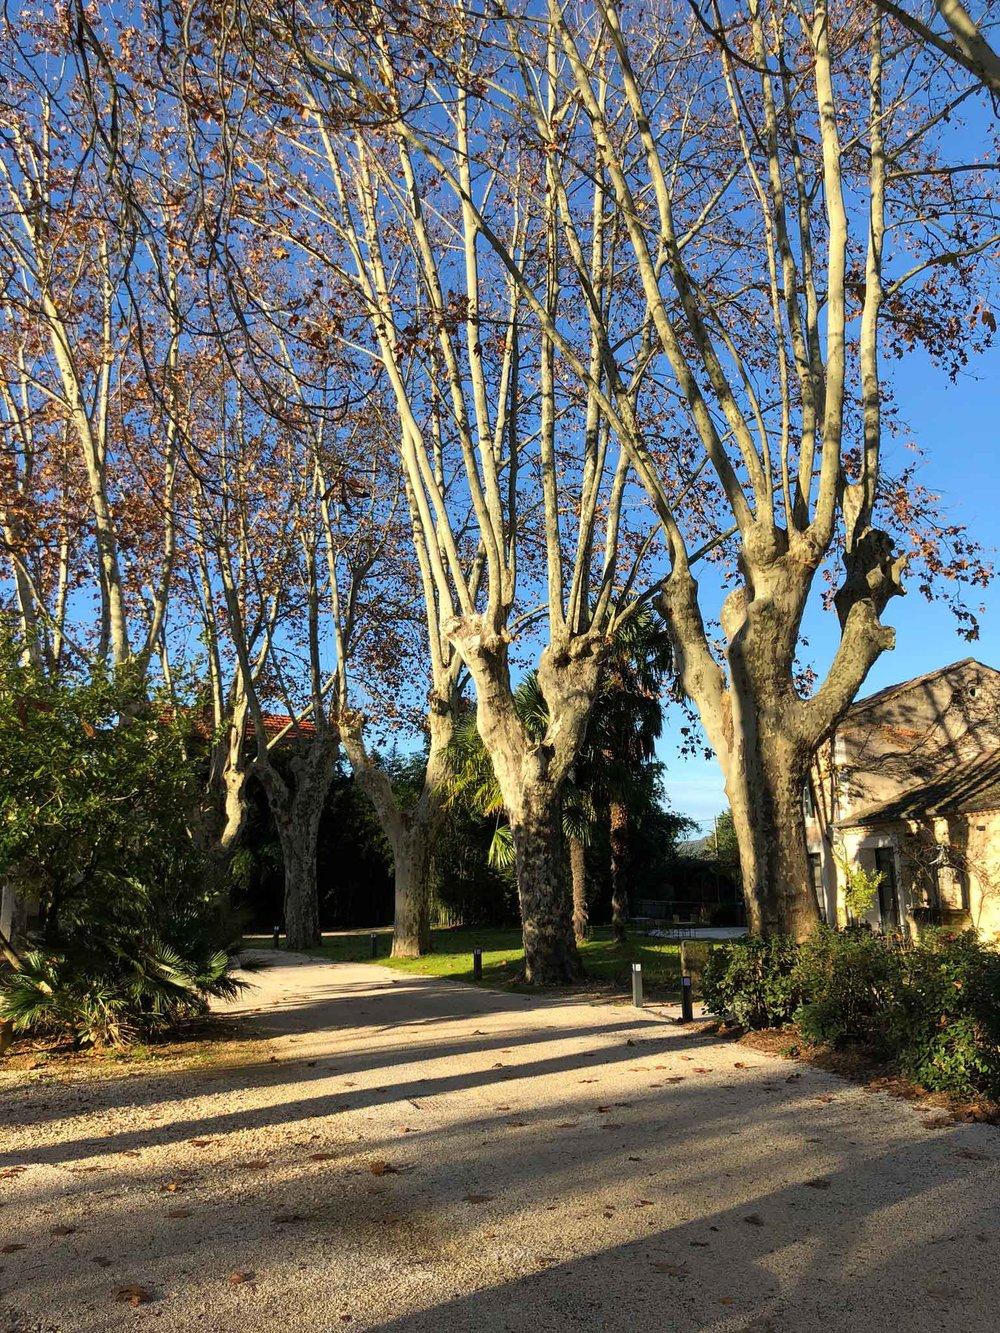 iria degen interiors chateau-de-montcaud france_02.jpg